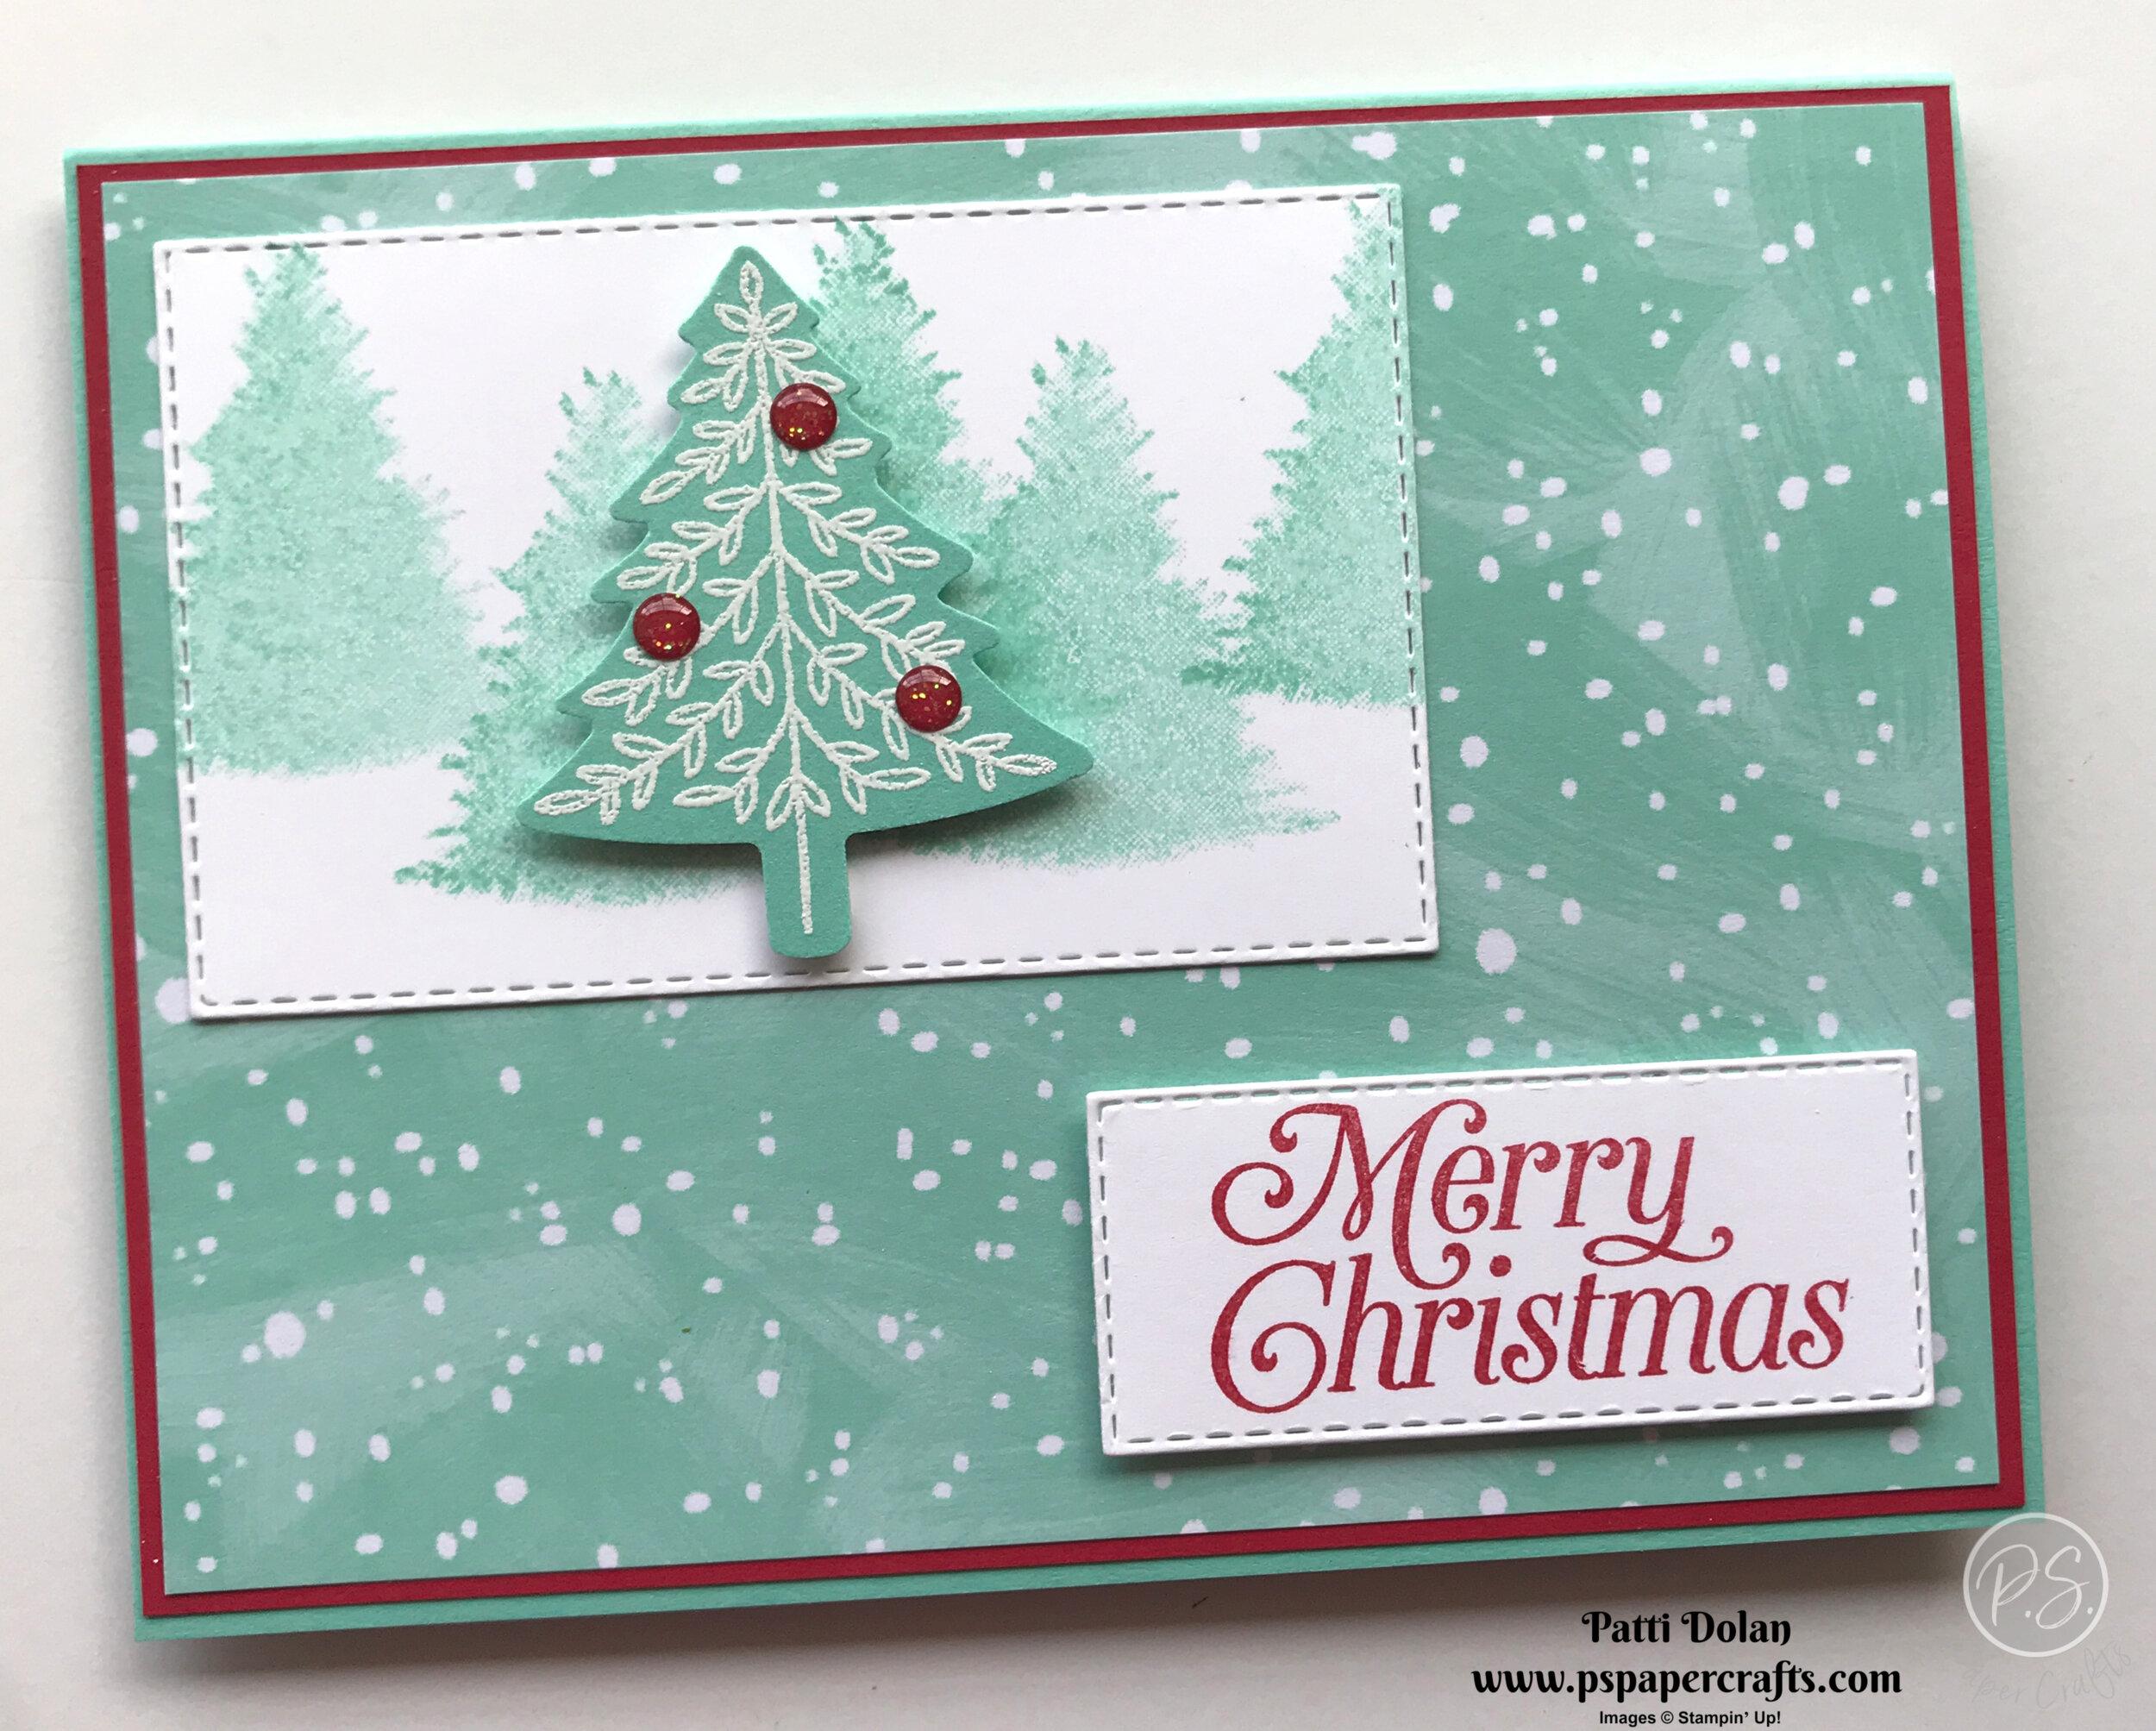 Merry Christmas Tree Card2.jpg